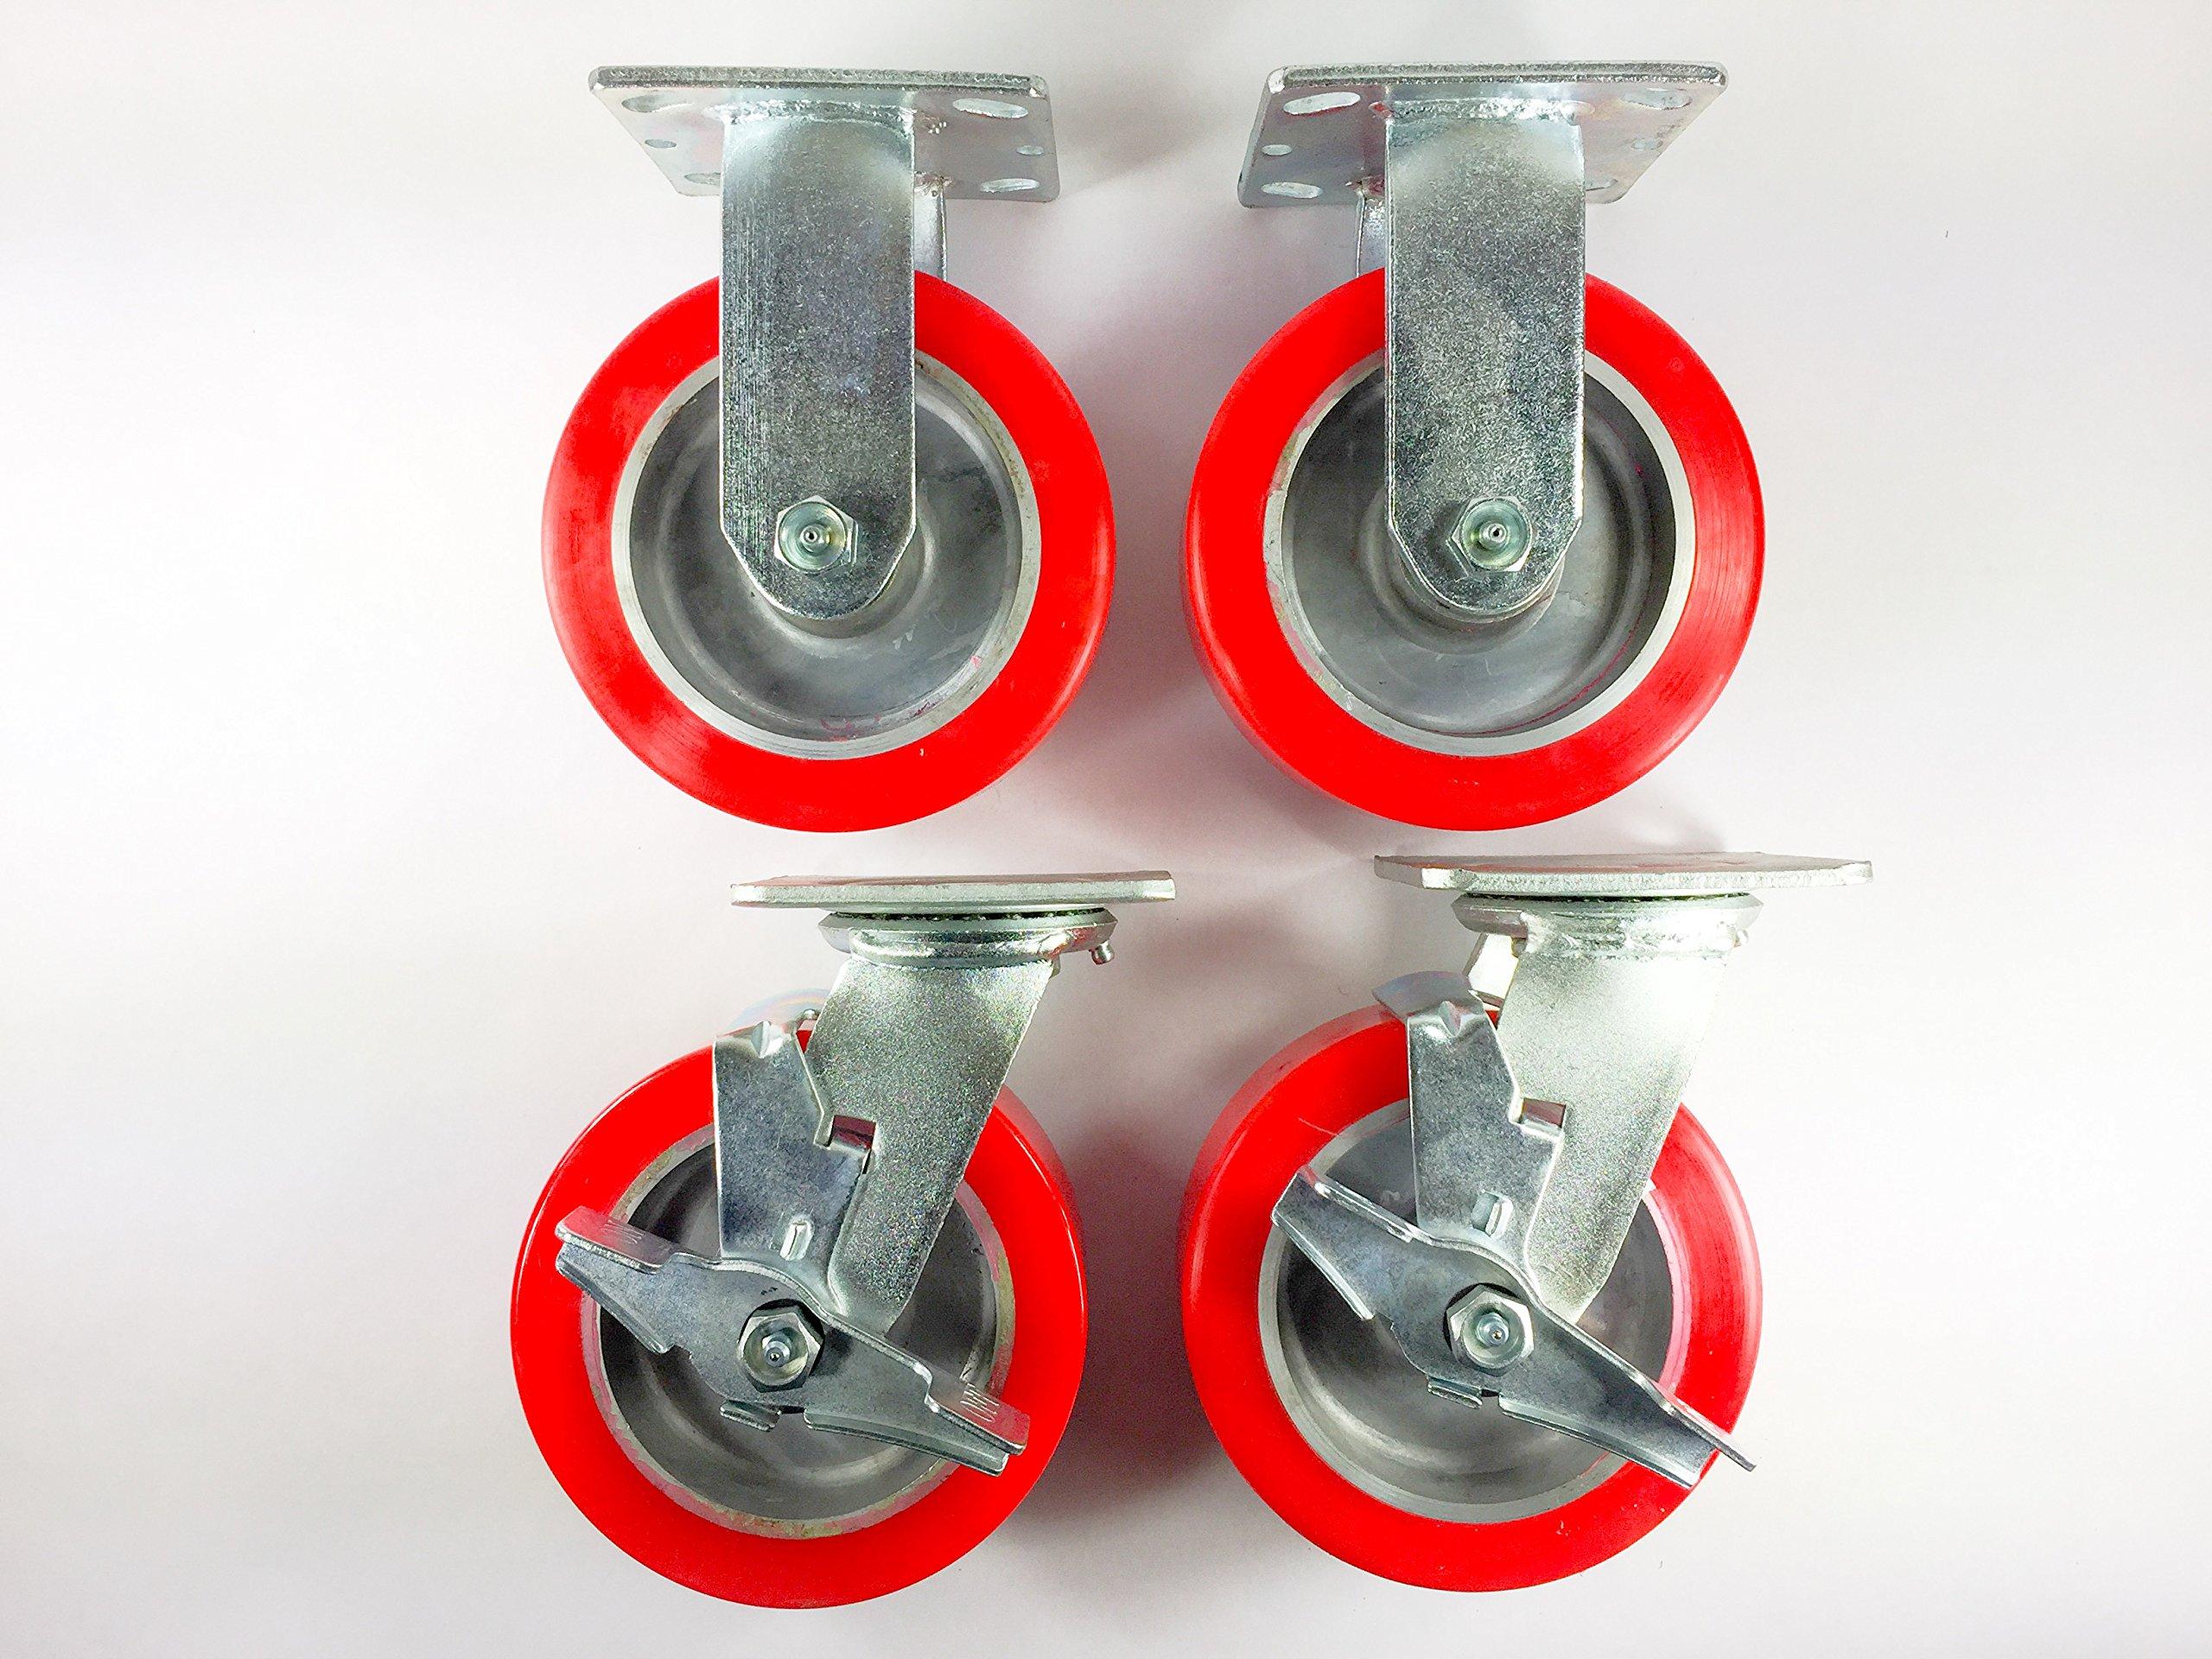 6'' X 2'' Polyurethane on Aluminum Caster - Rigid (2ea) & Swivel with Brake (2ea)